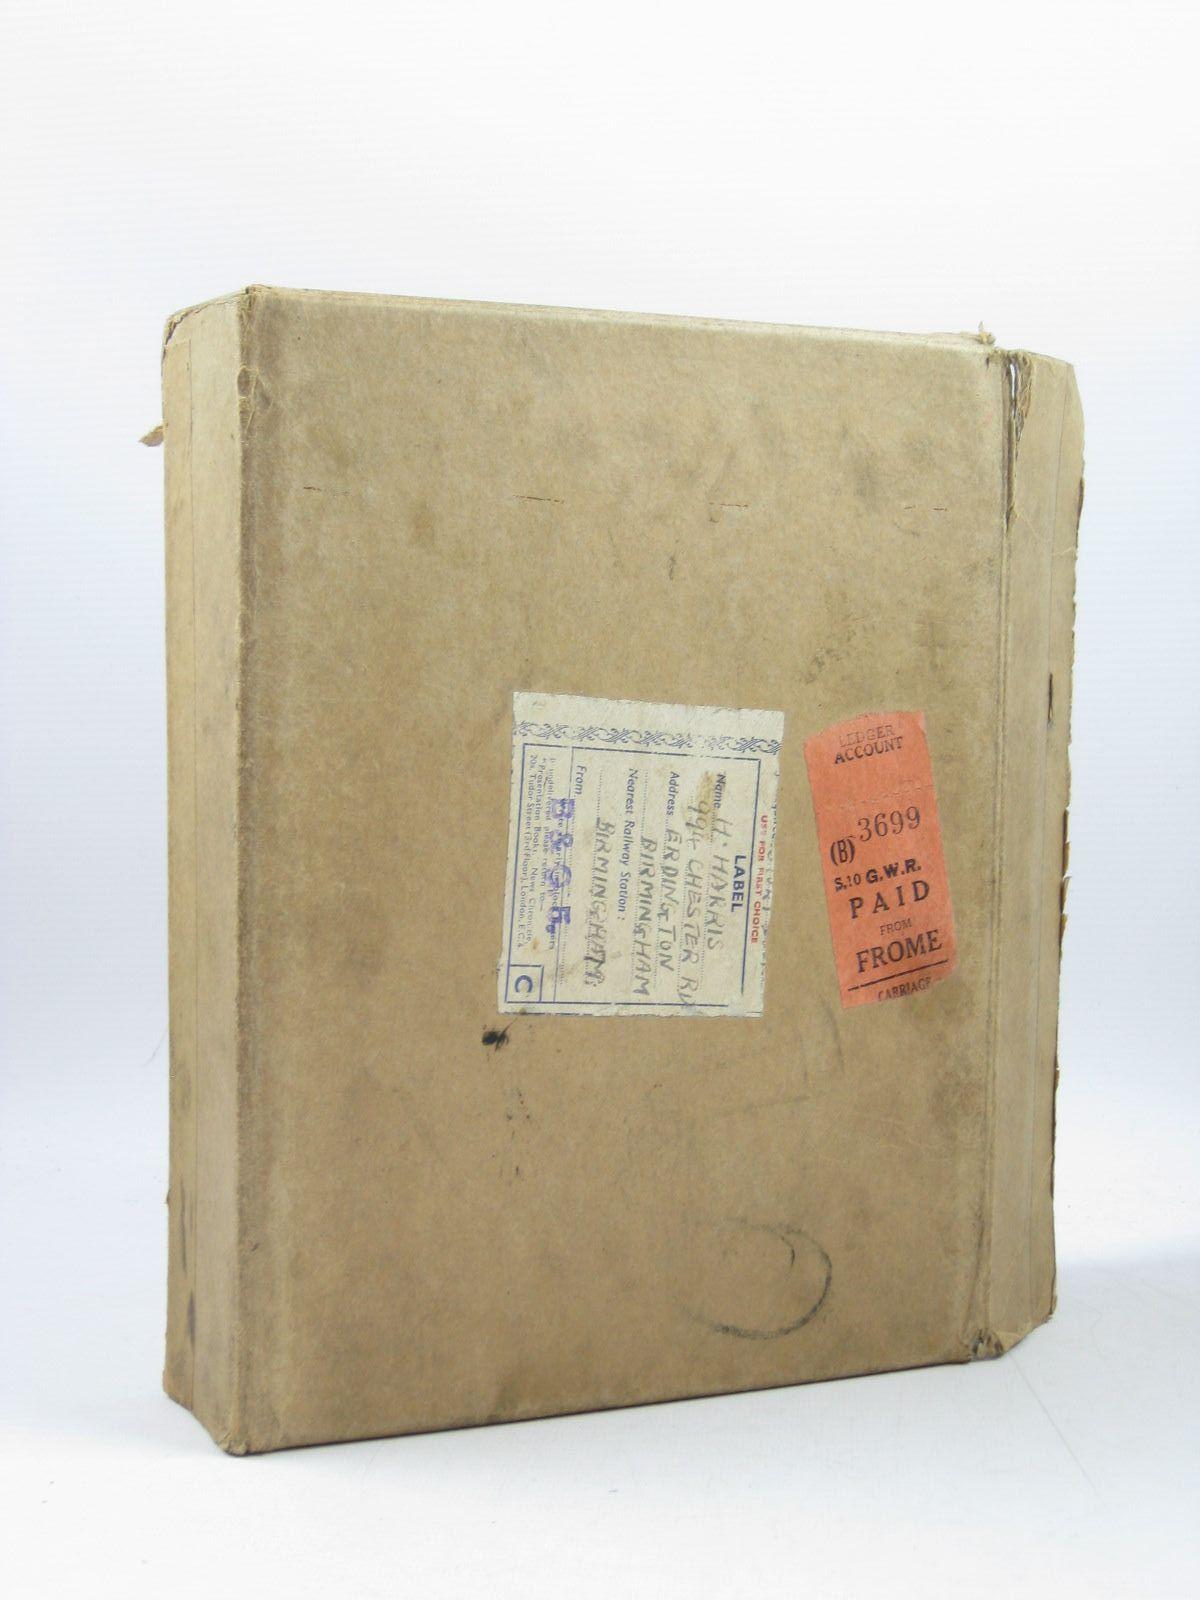 enid blyton story books pdf